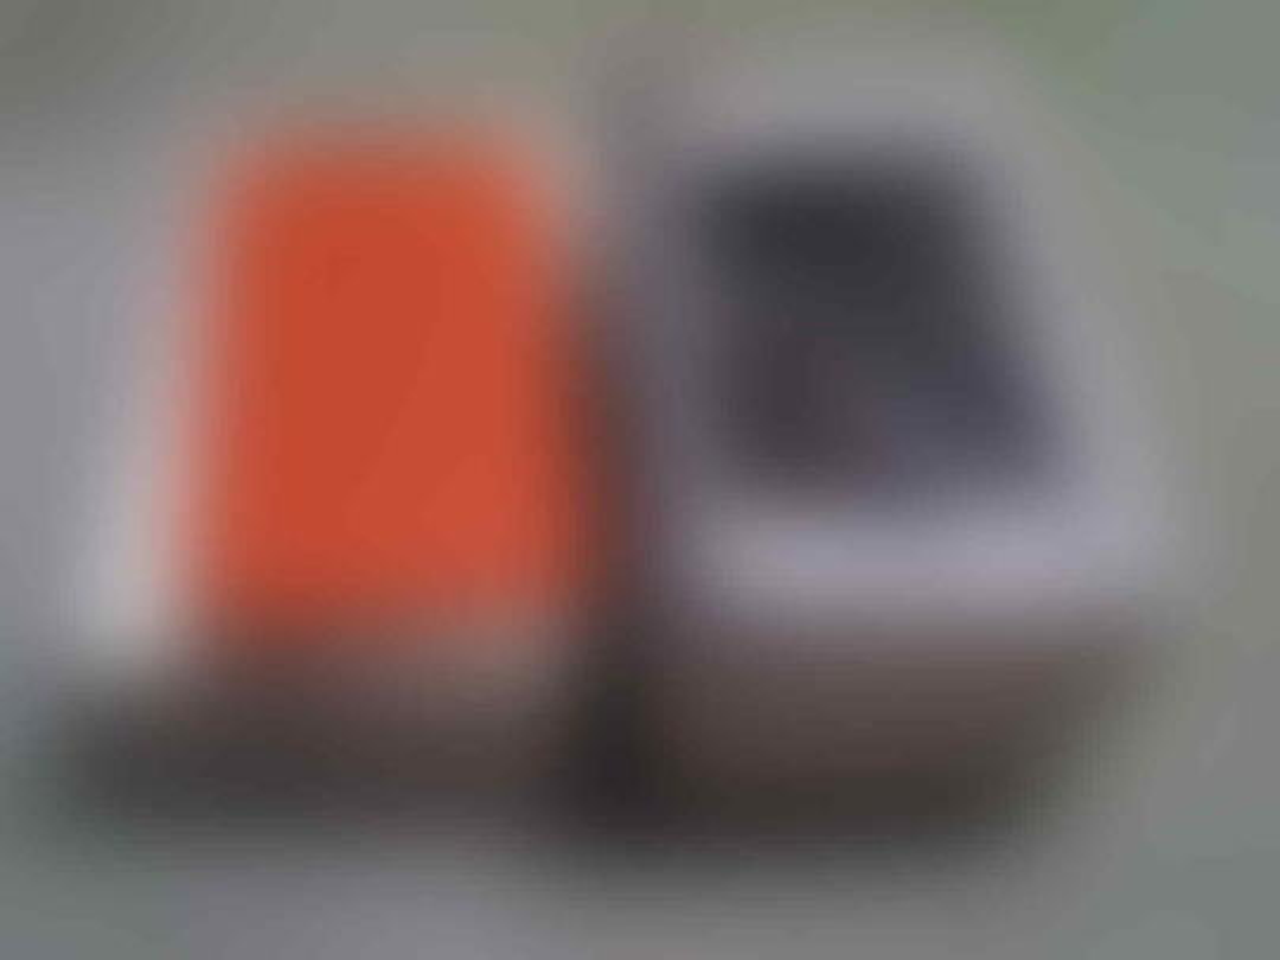 Samsung Galaxy Note n7000 /Galaxy Note 1 white exSEIN Fullset masuk dulu gan